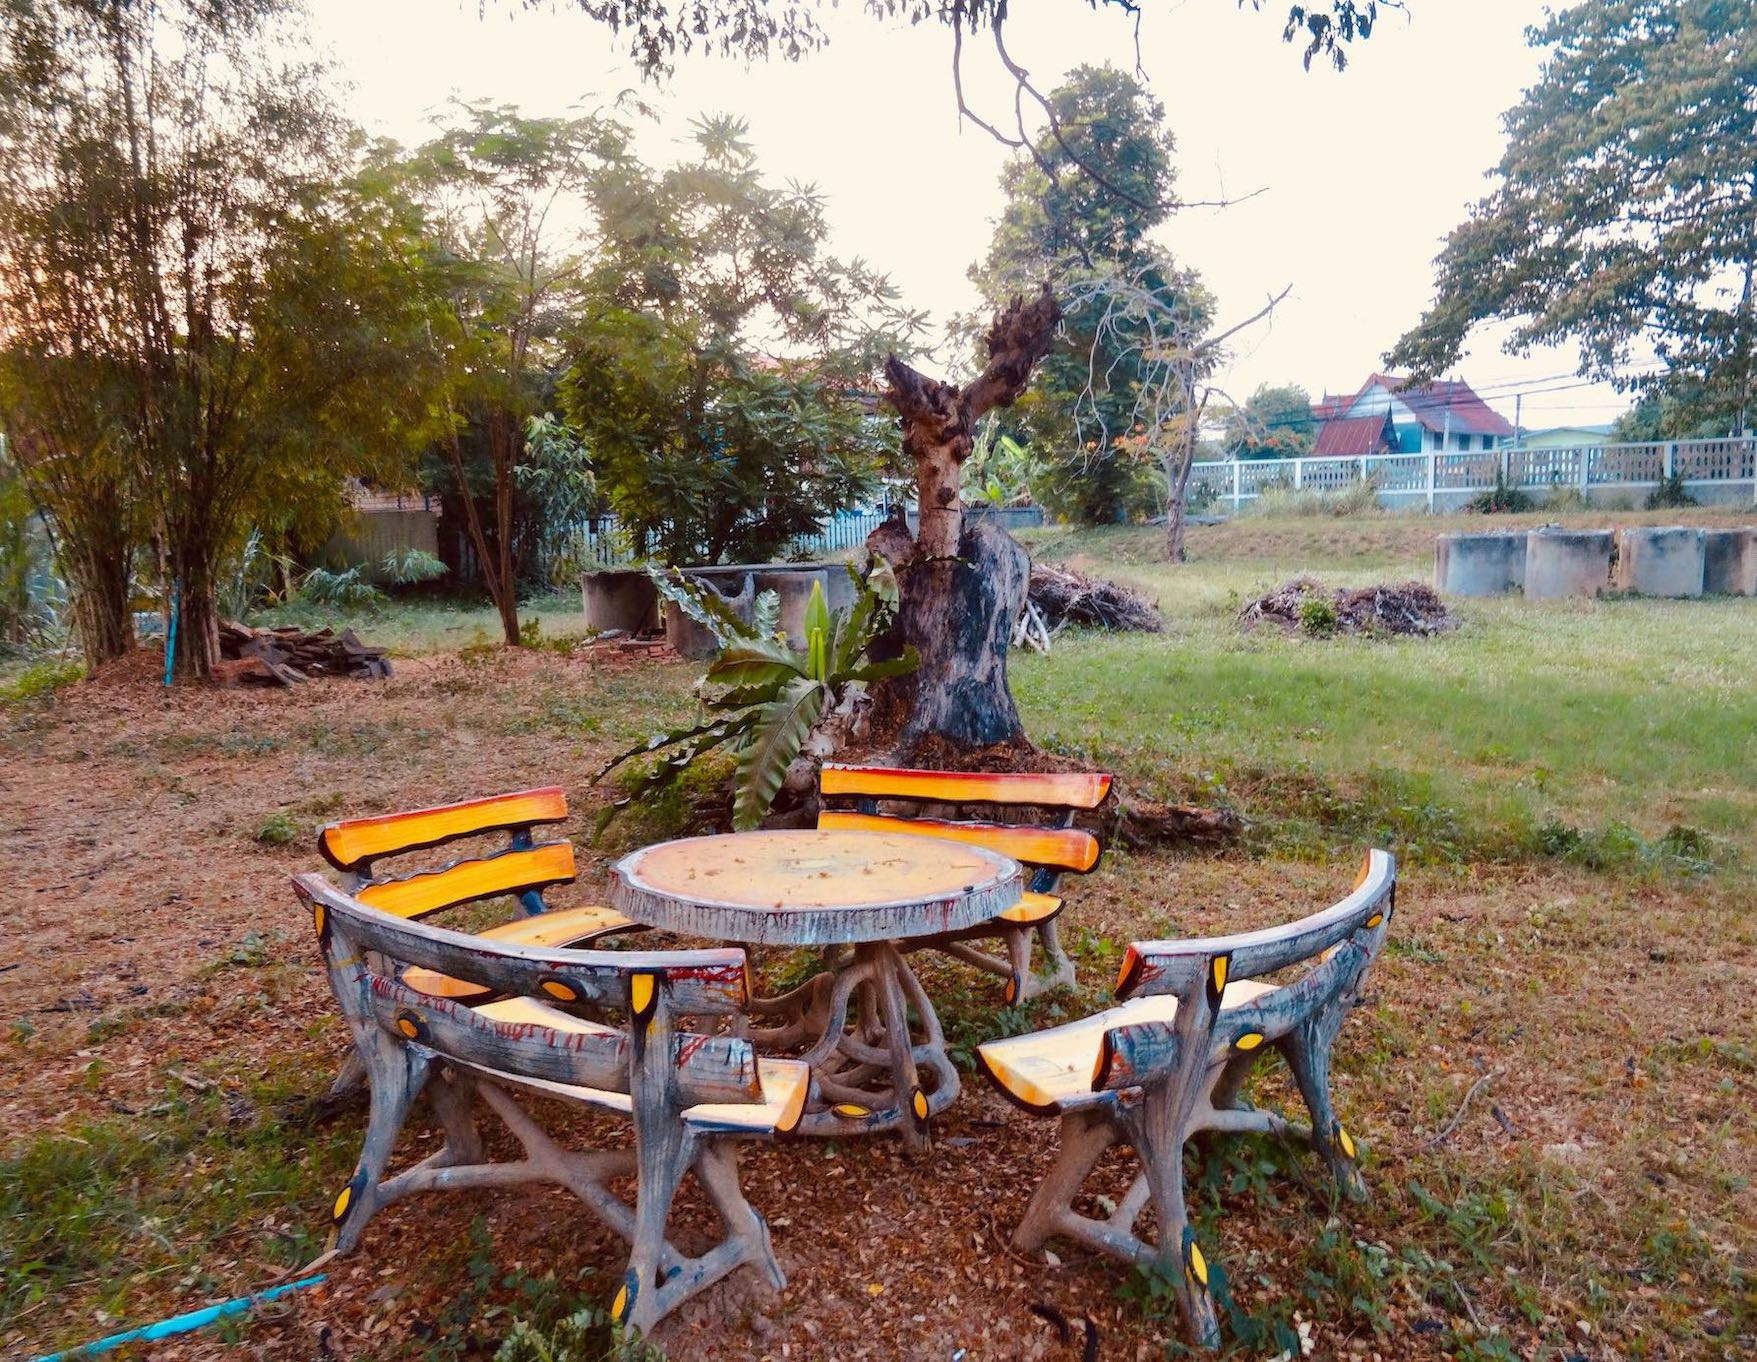 The garden at Baan Lotus Guesthouse in Ayutthaya